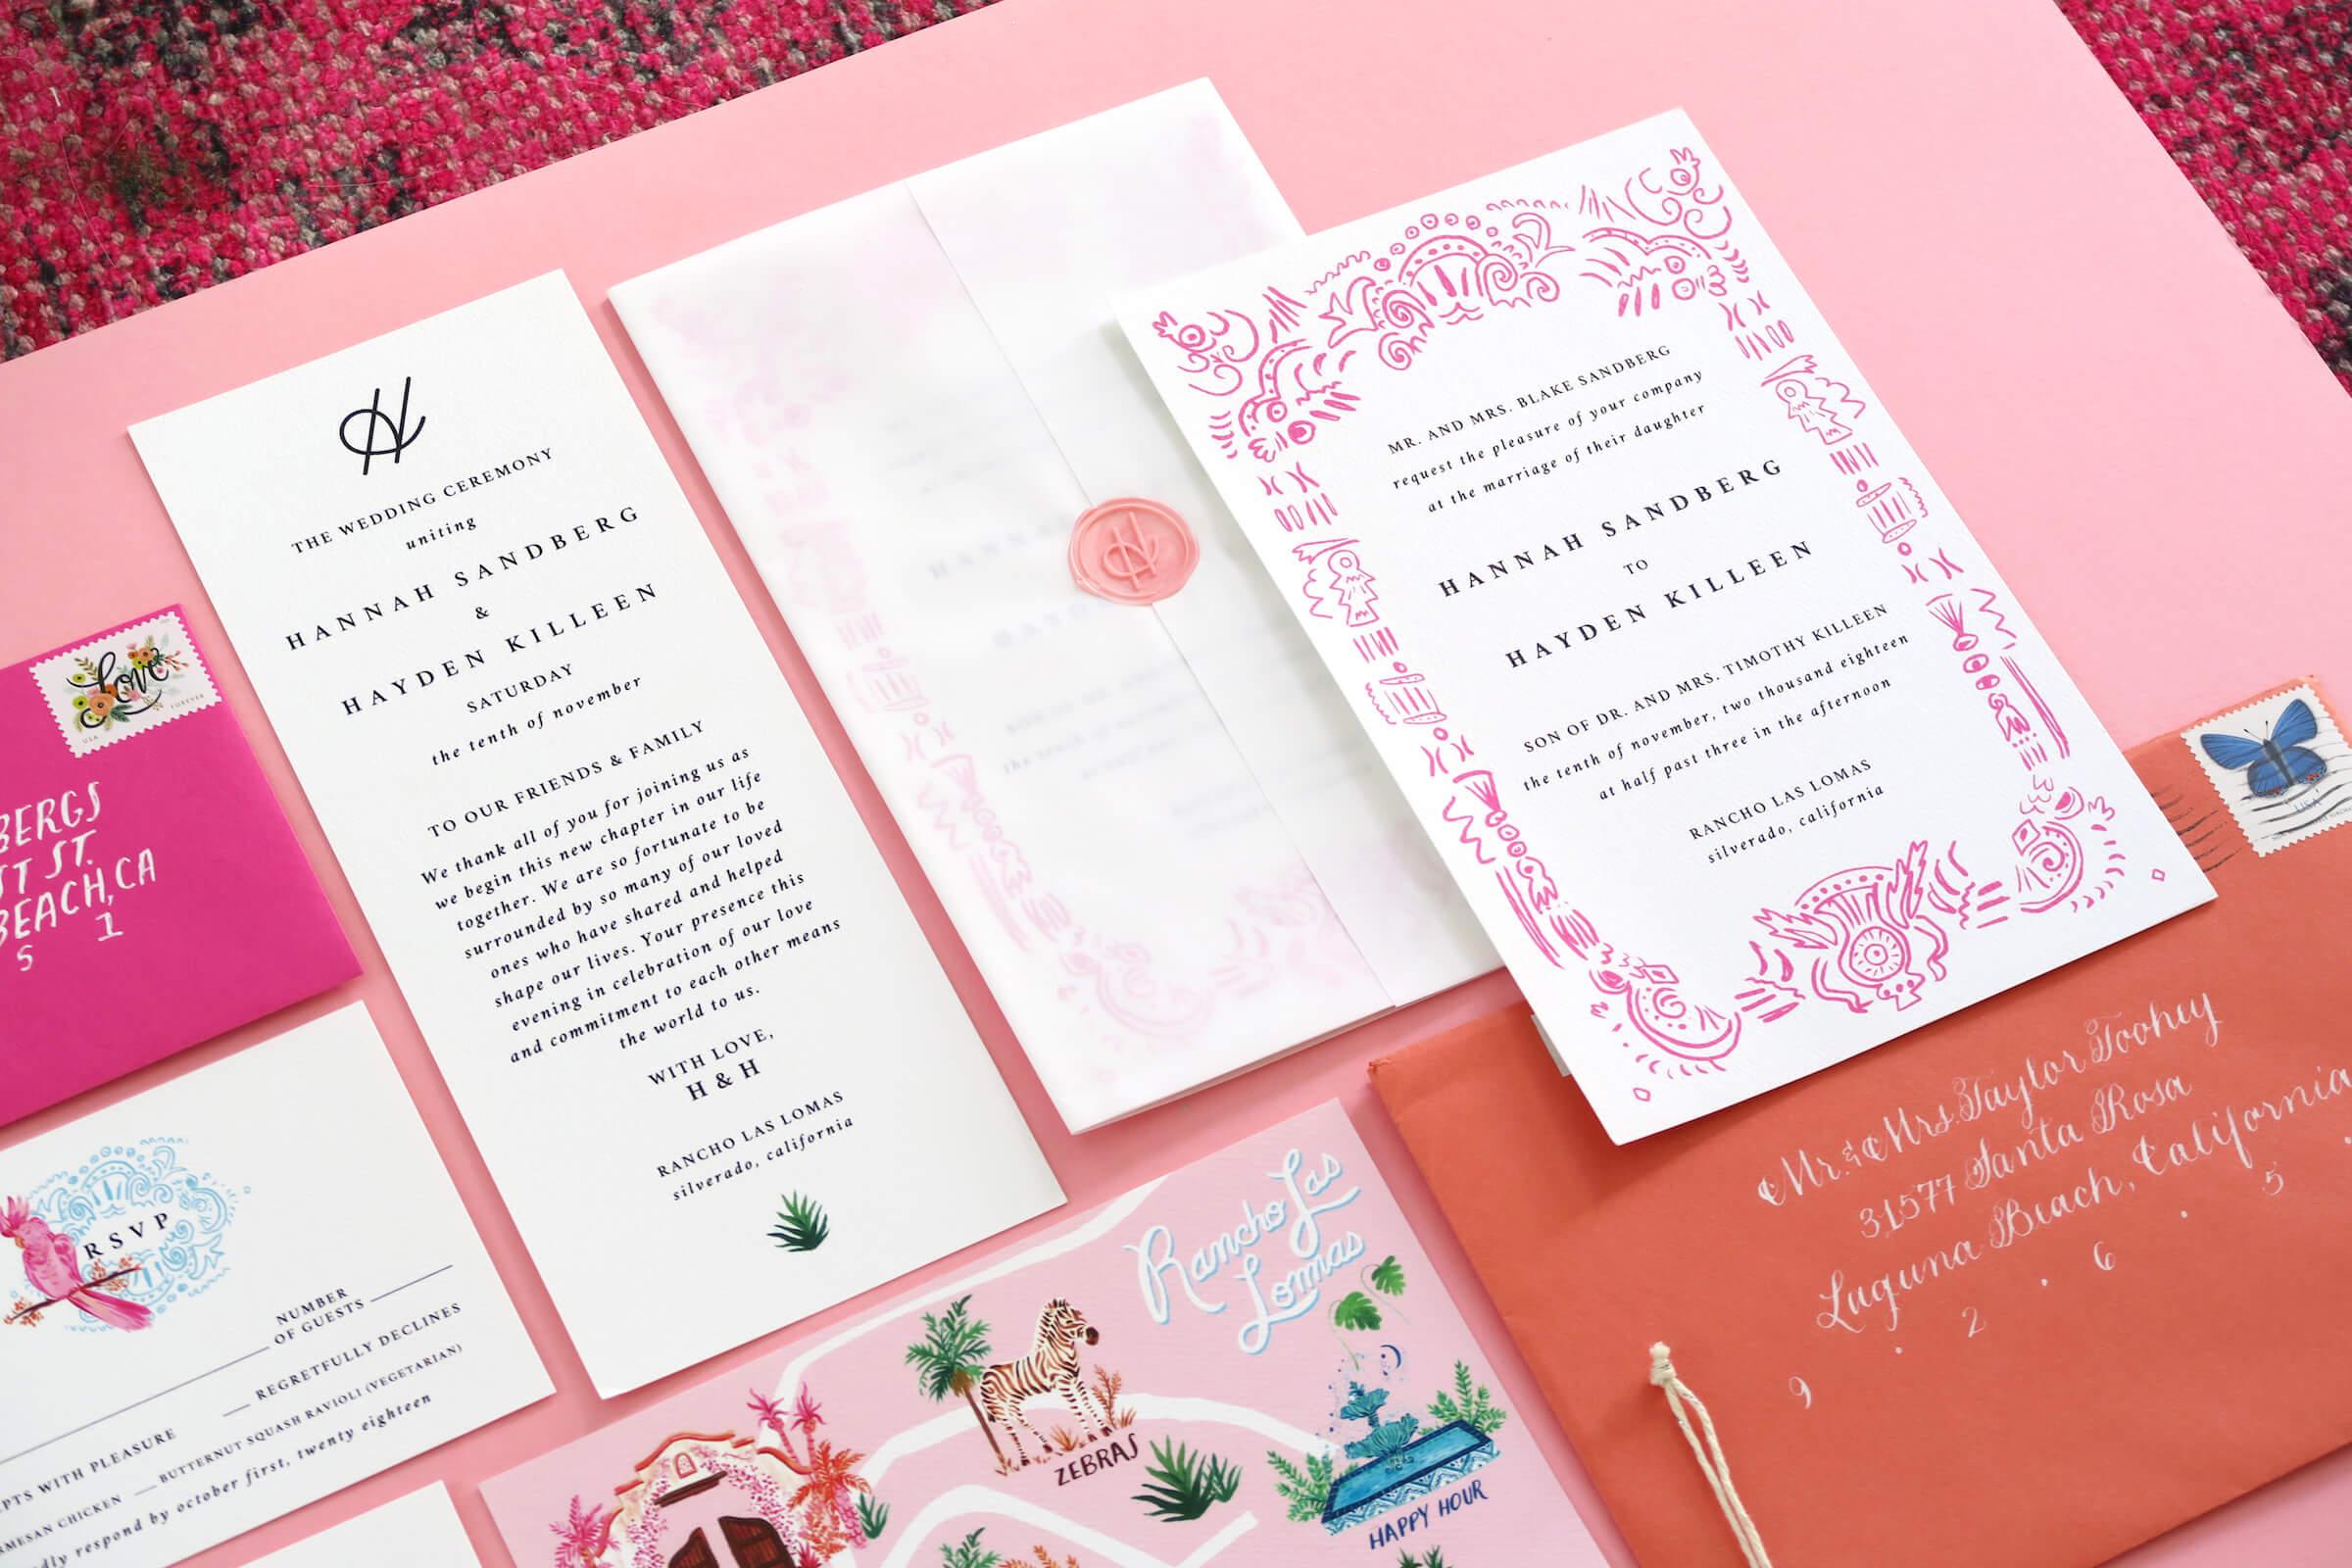 EVent design & paper goods - A Hidden Kingdom Love Story